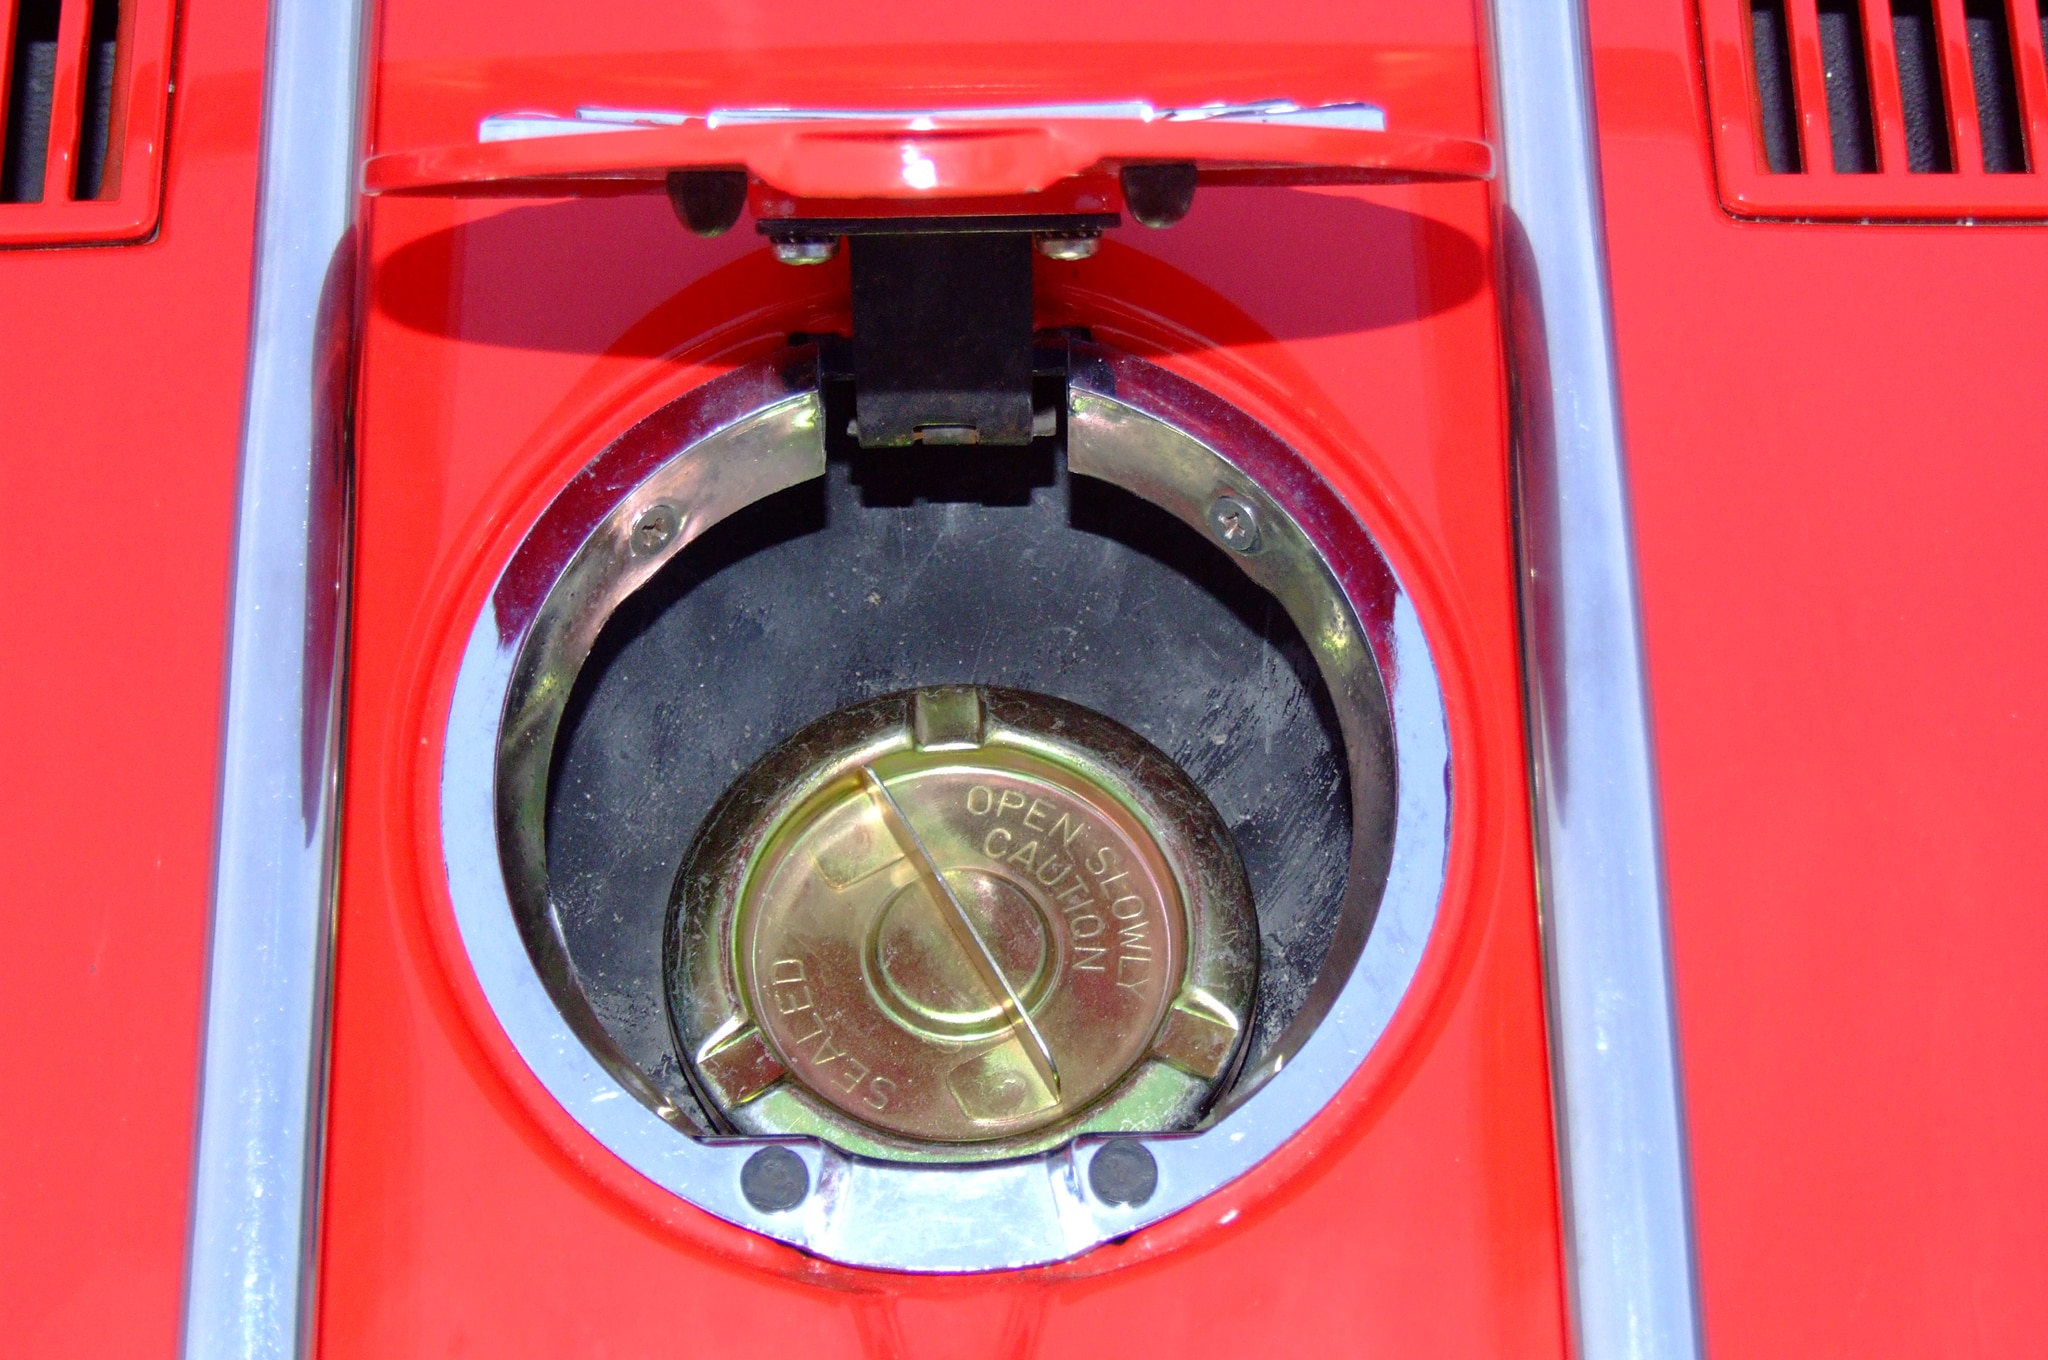 1970 Vapor Control System Vacuum Hose Routingbase System Shown